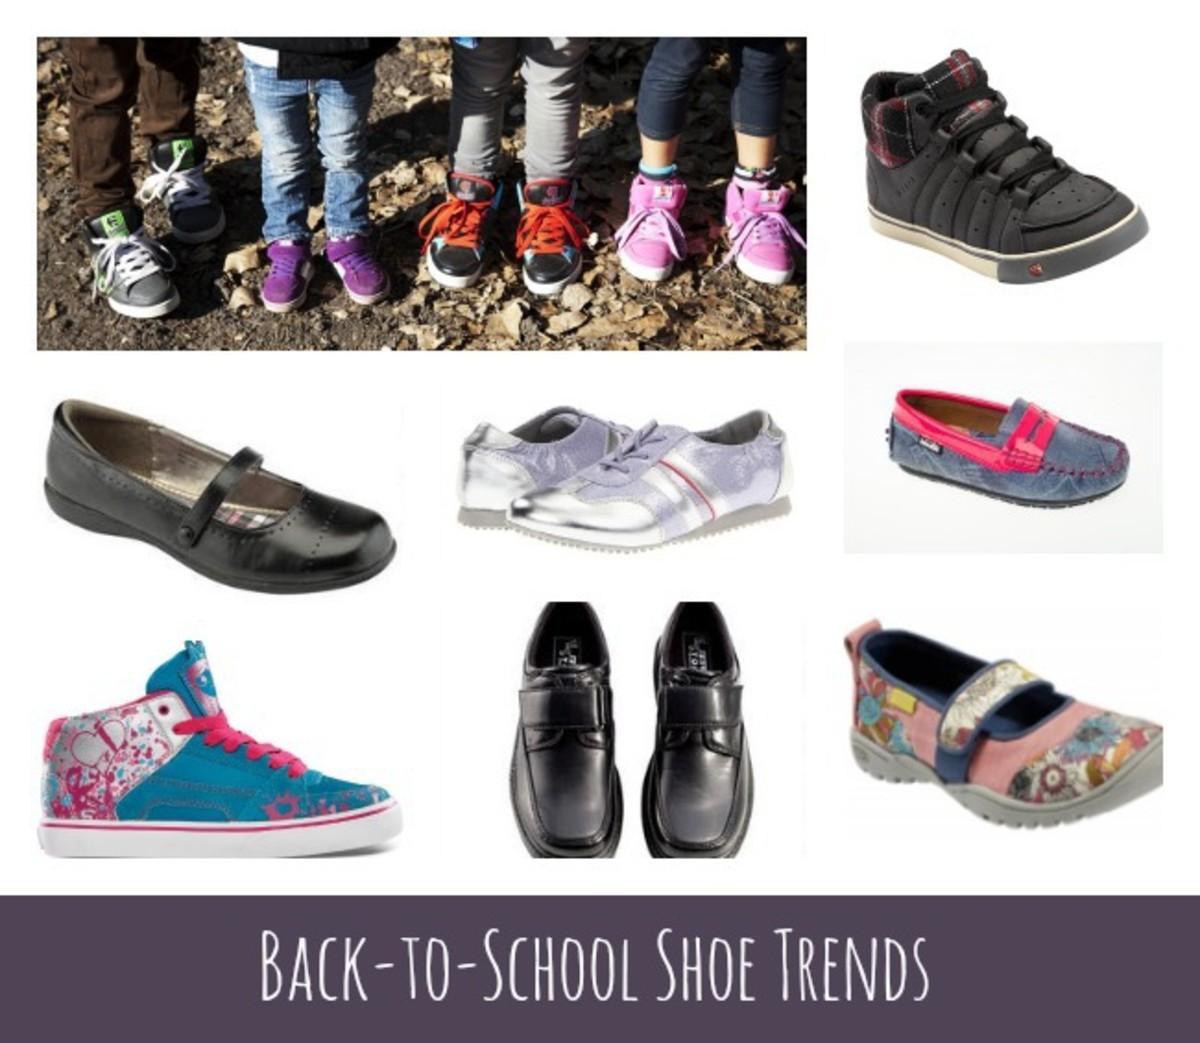 shoe trends. shoe trends for kids, back to school